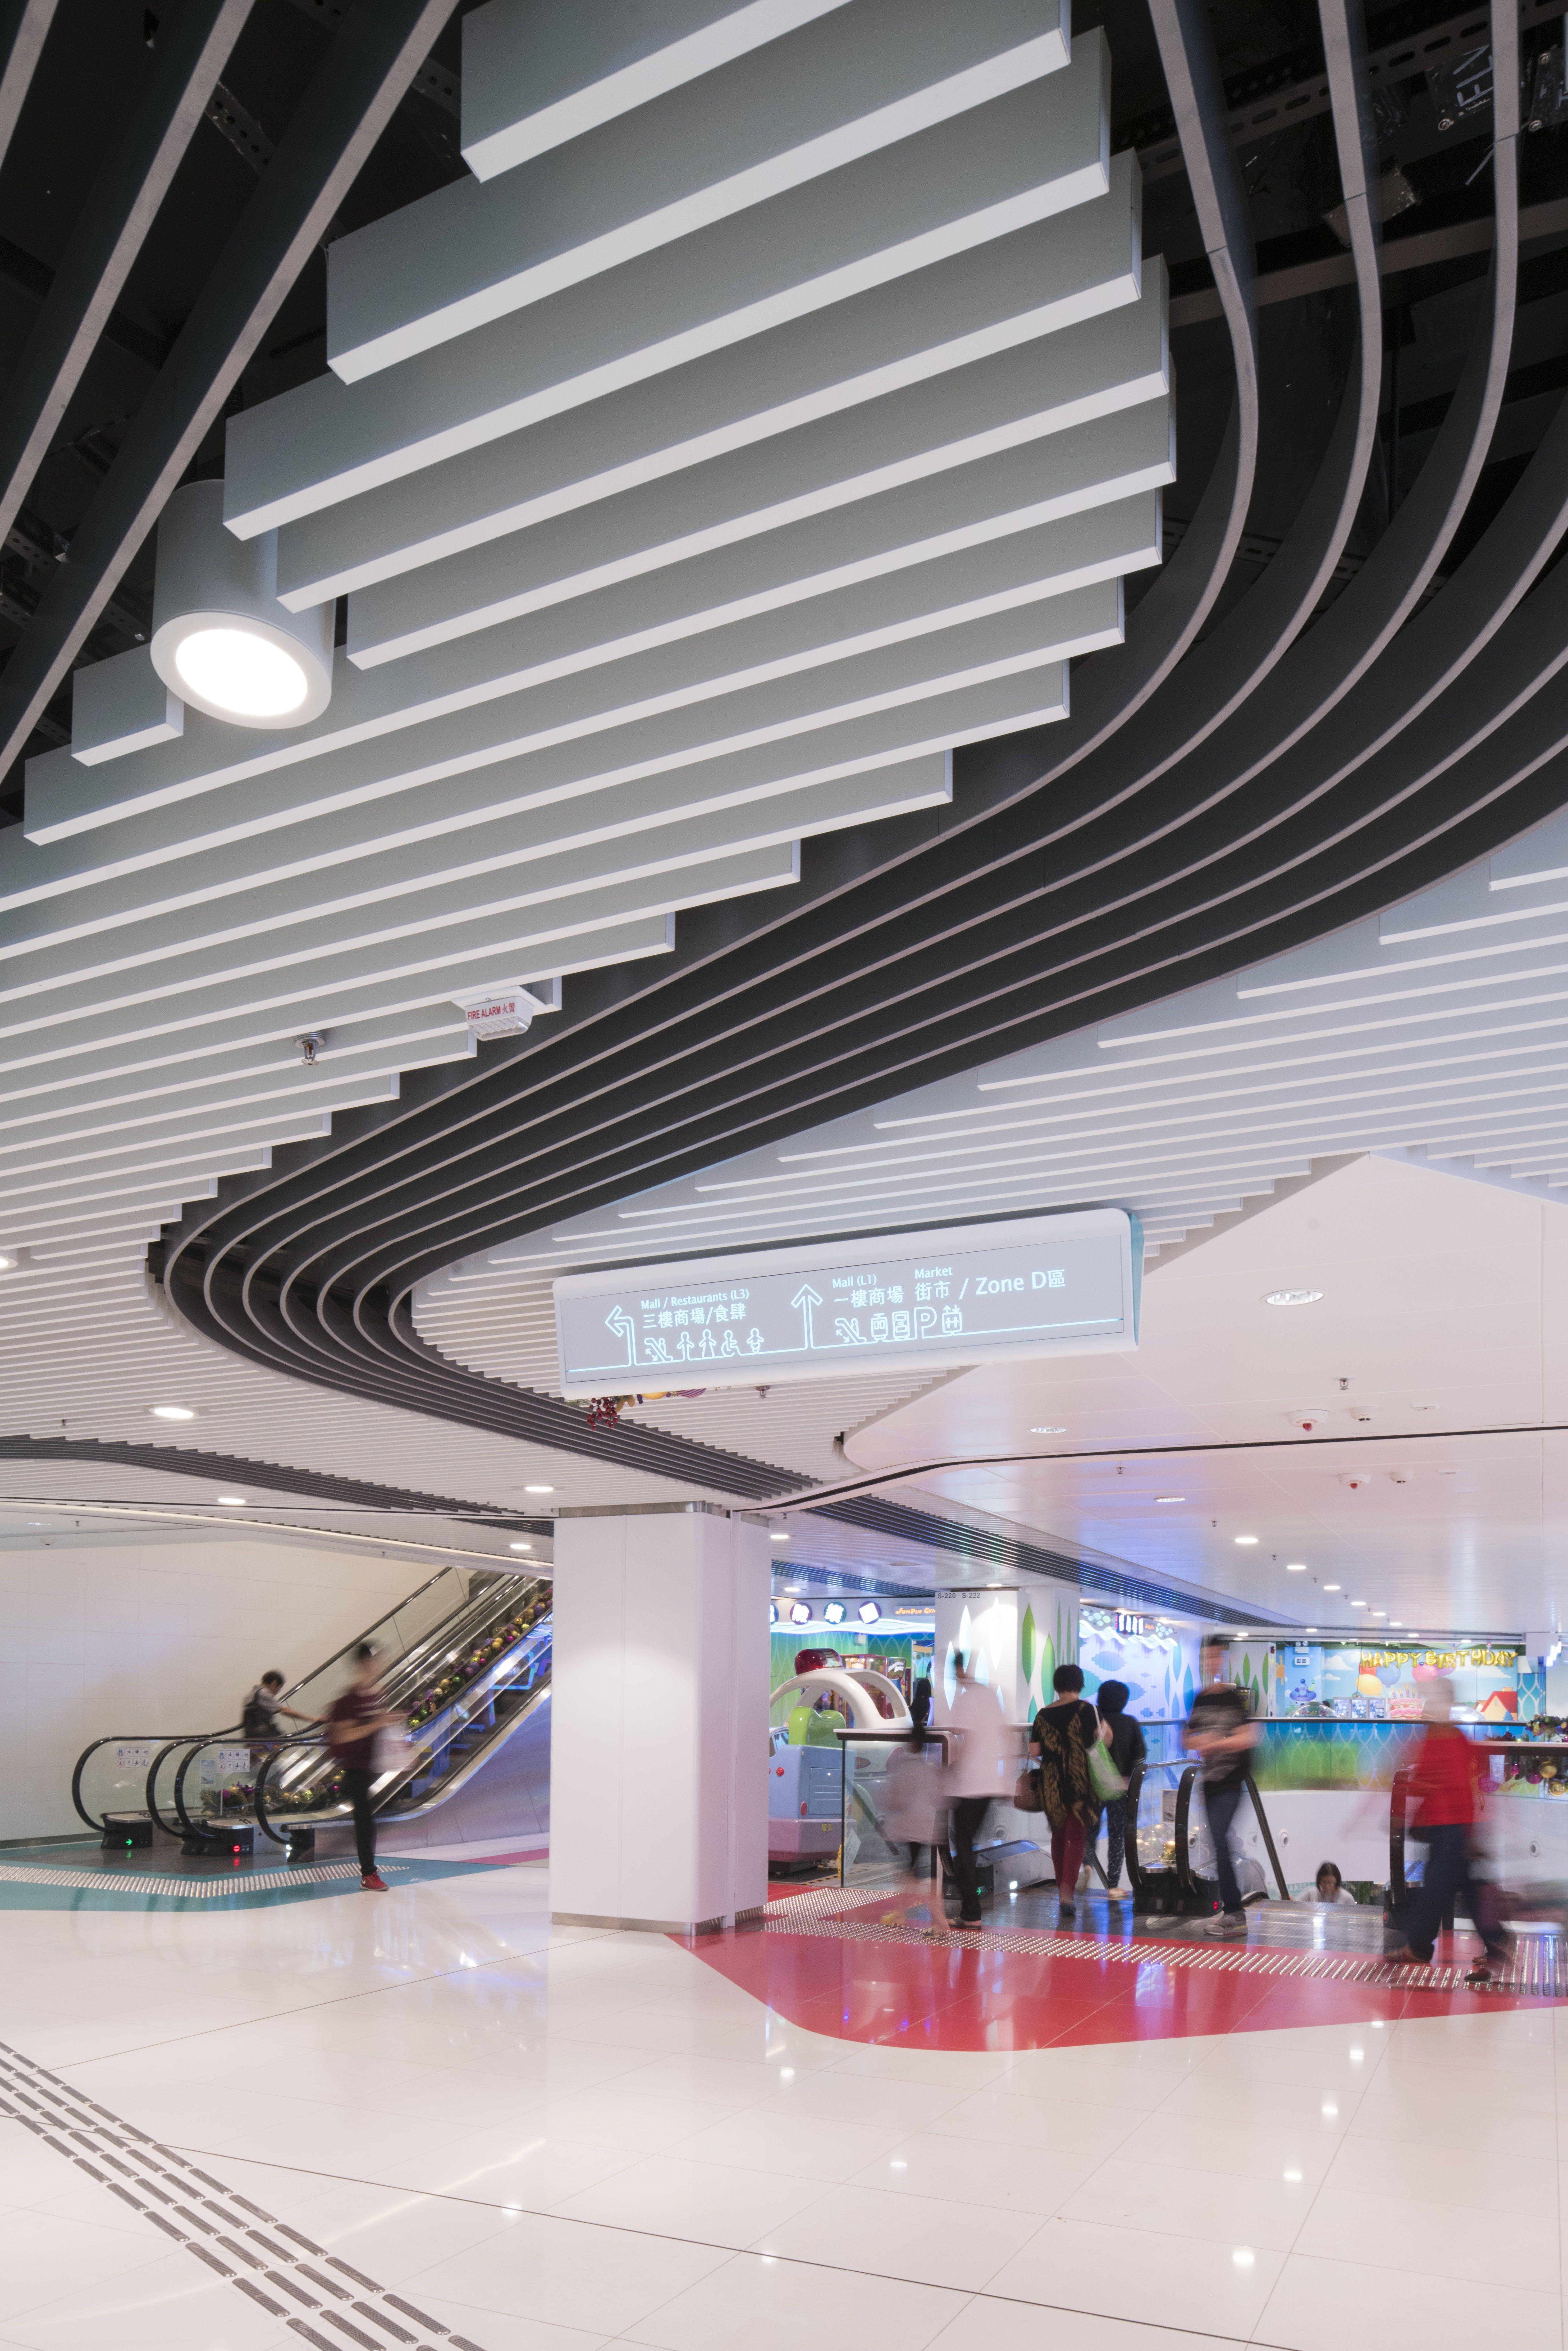 Yoot Hands Hk Ceiling Light Design False Ceiling Design Ceiling Design